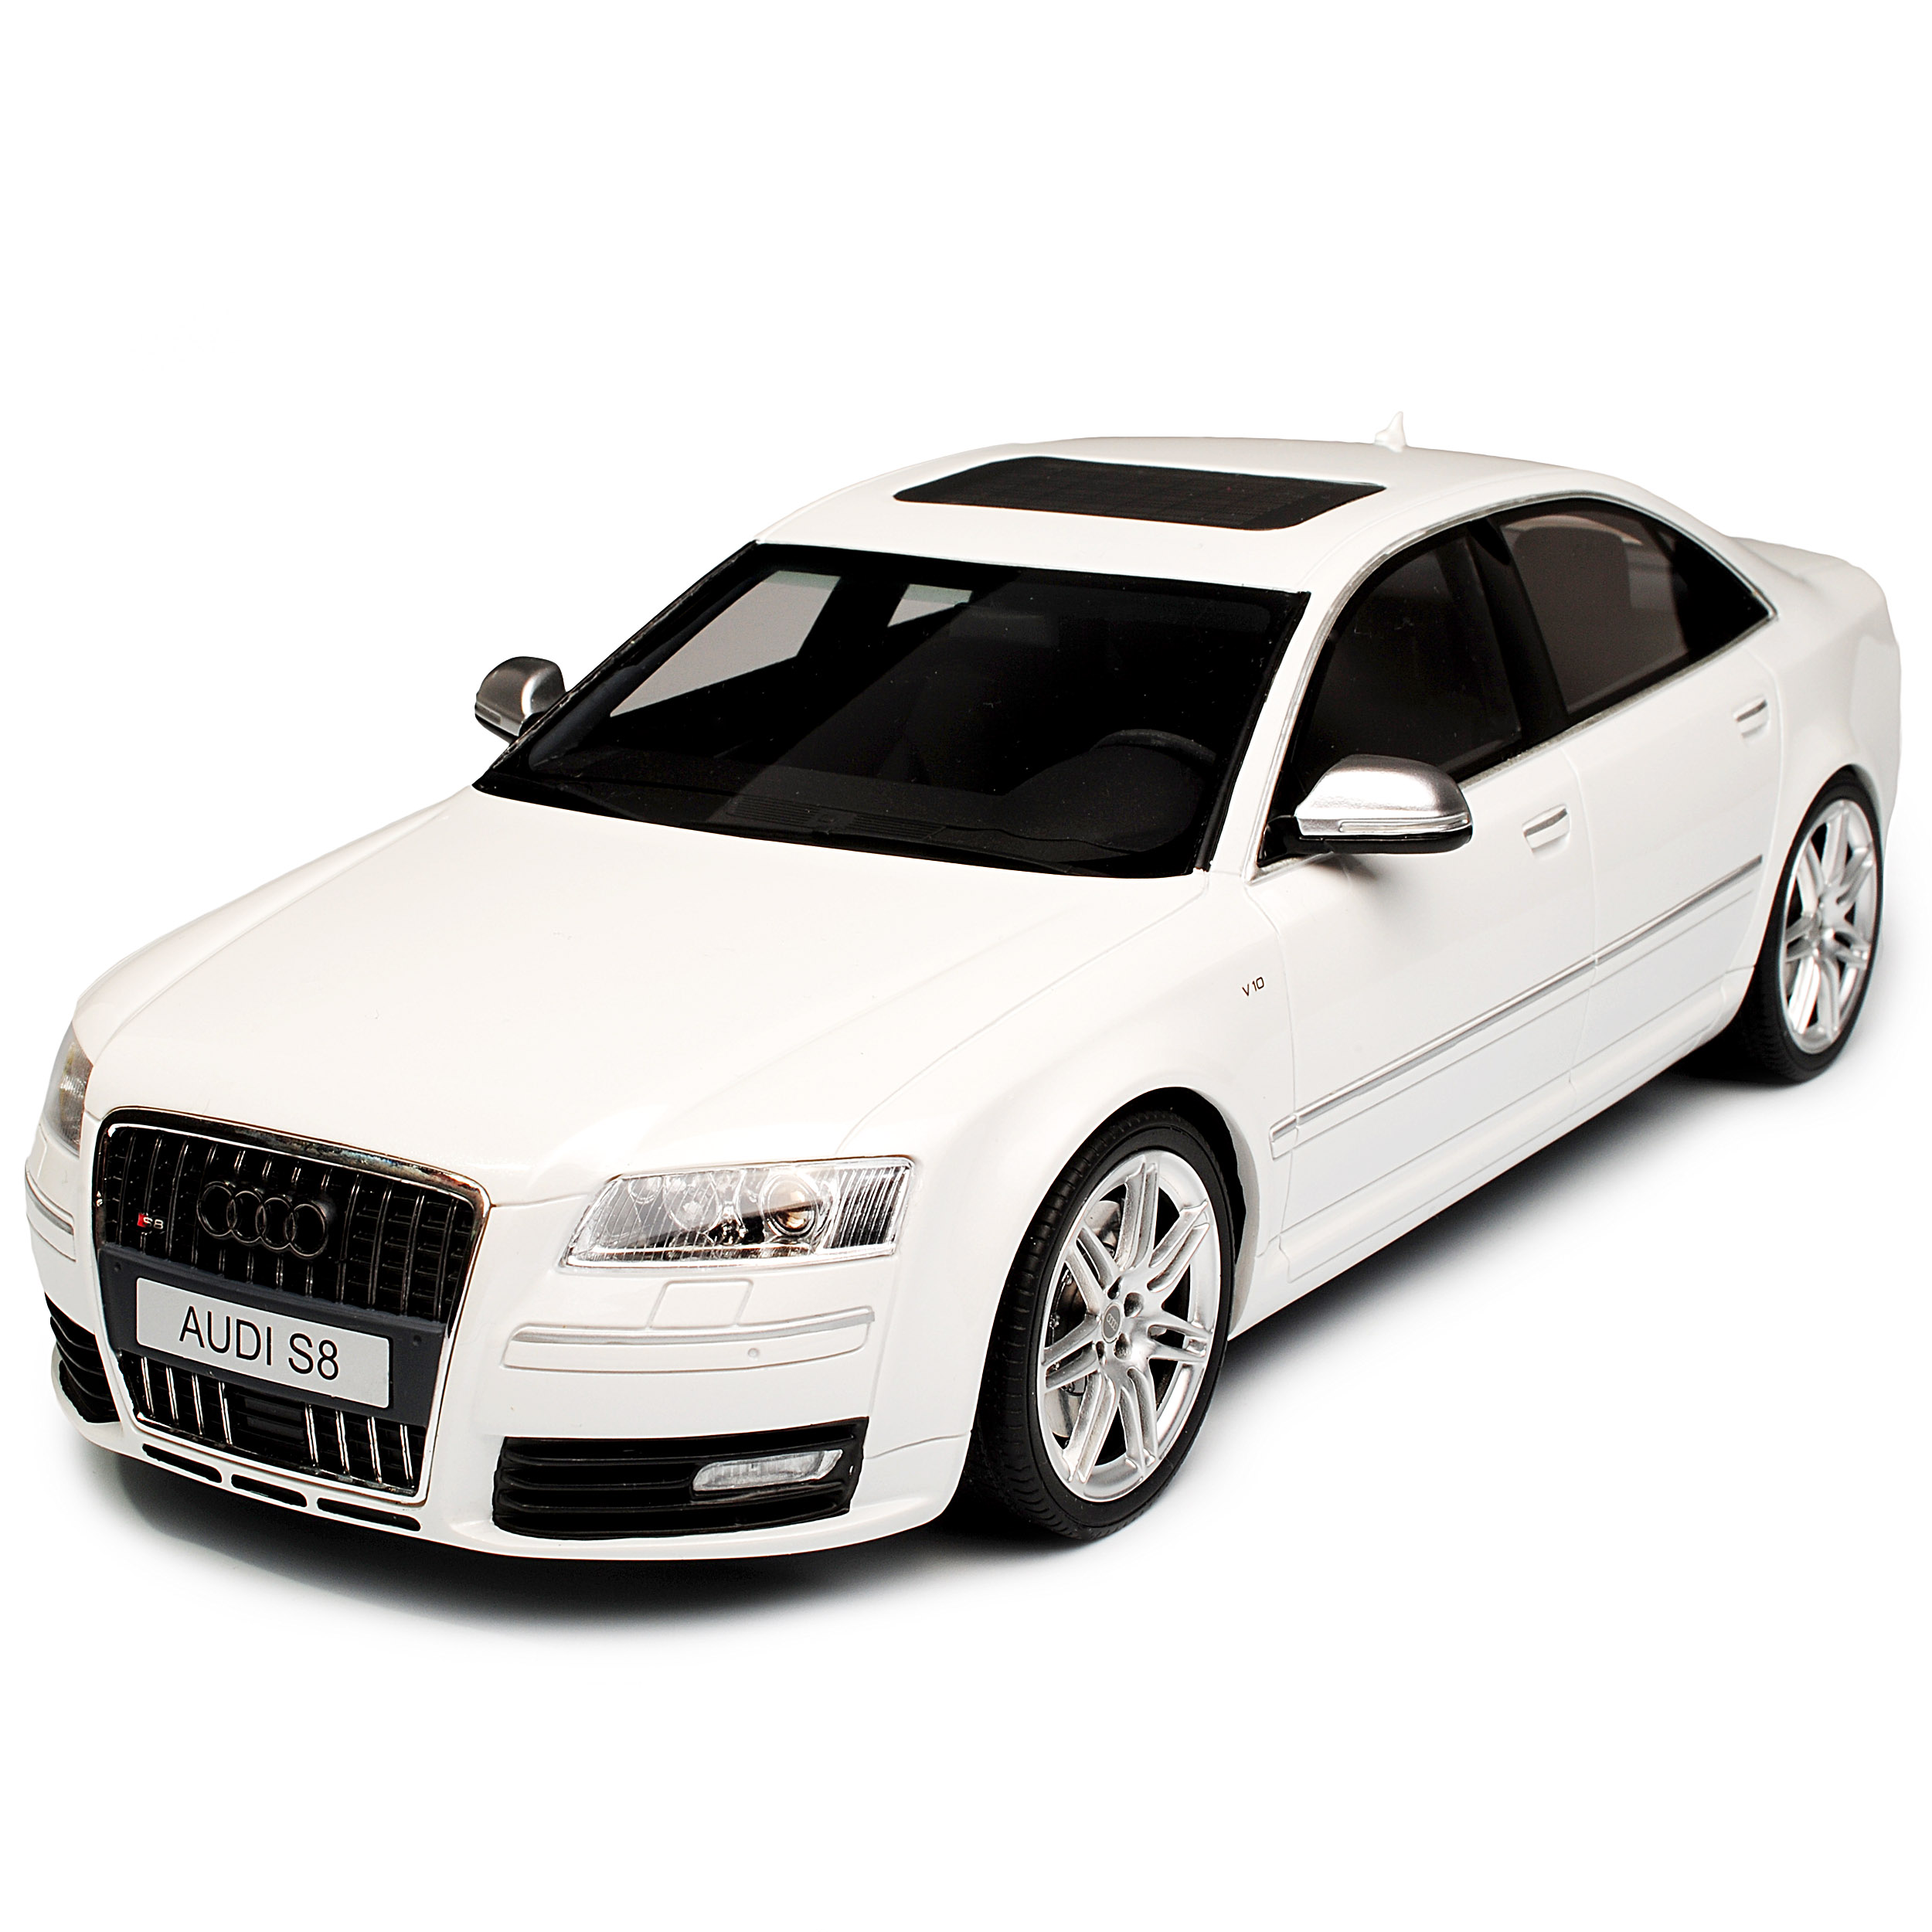 Audi A8 S8 D3 Weiss Limousine 2. Generation 2002-2010 Nr